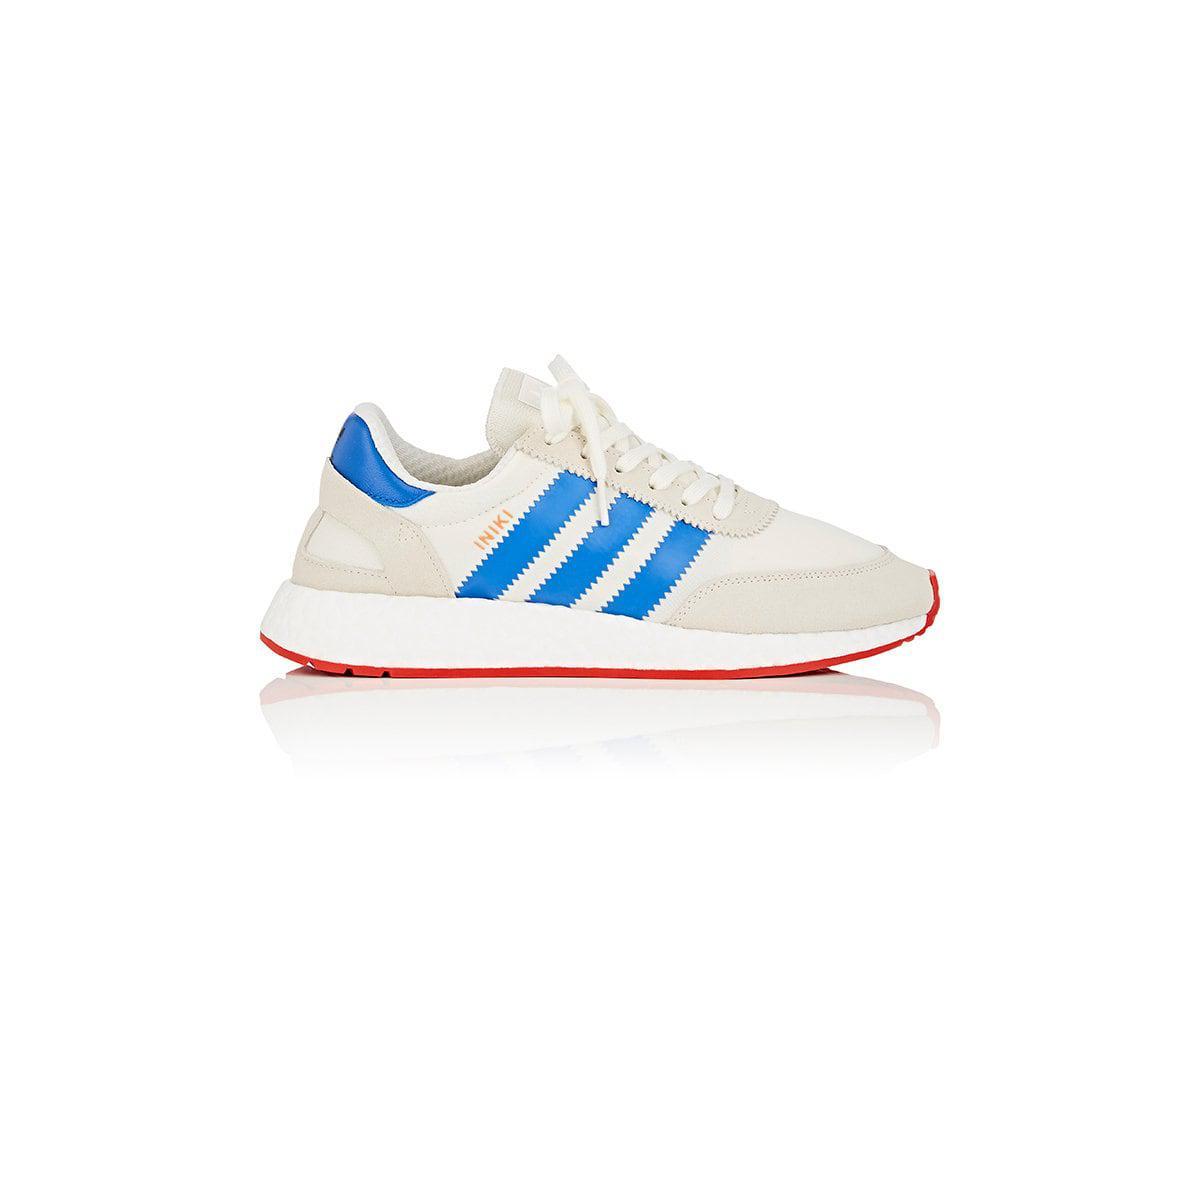 Lyst Adidas Iniki Runner Scarpe Blu Per Gli Uomini.